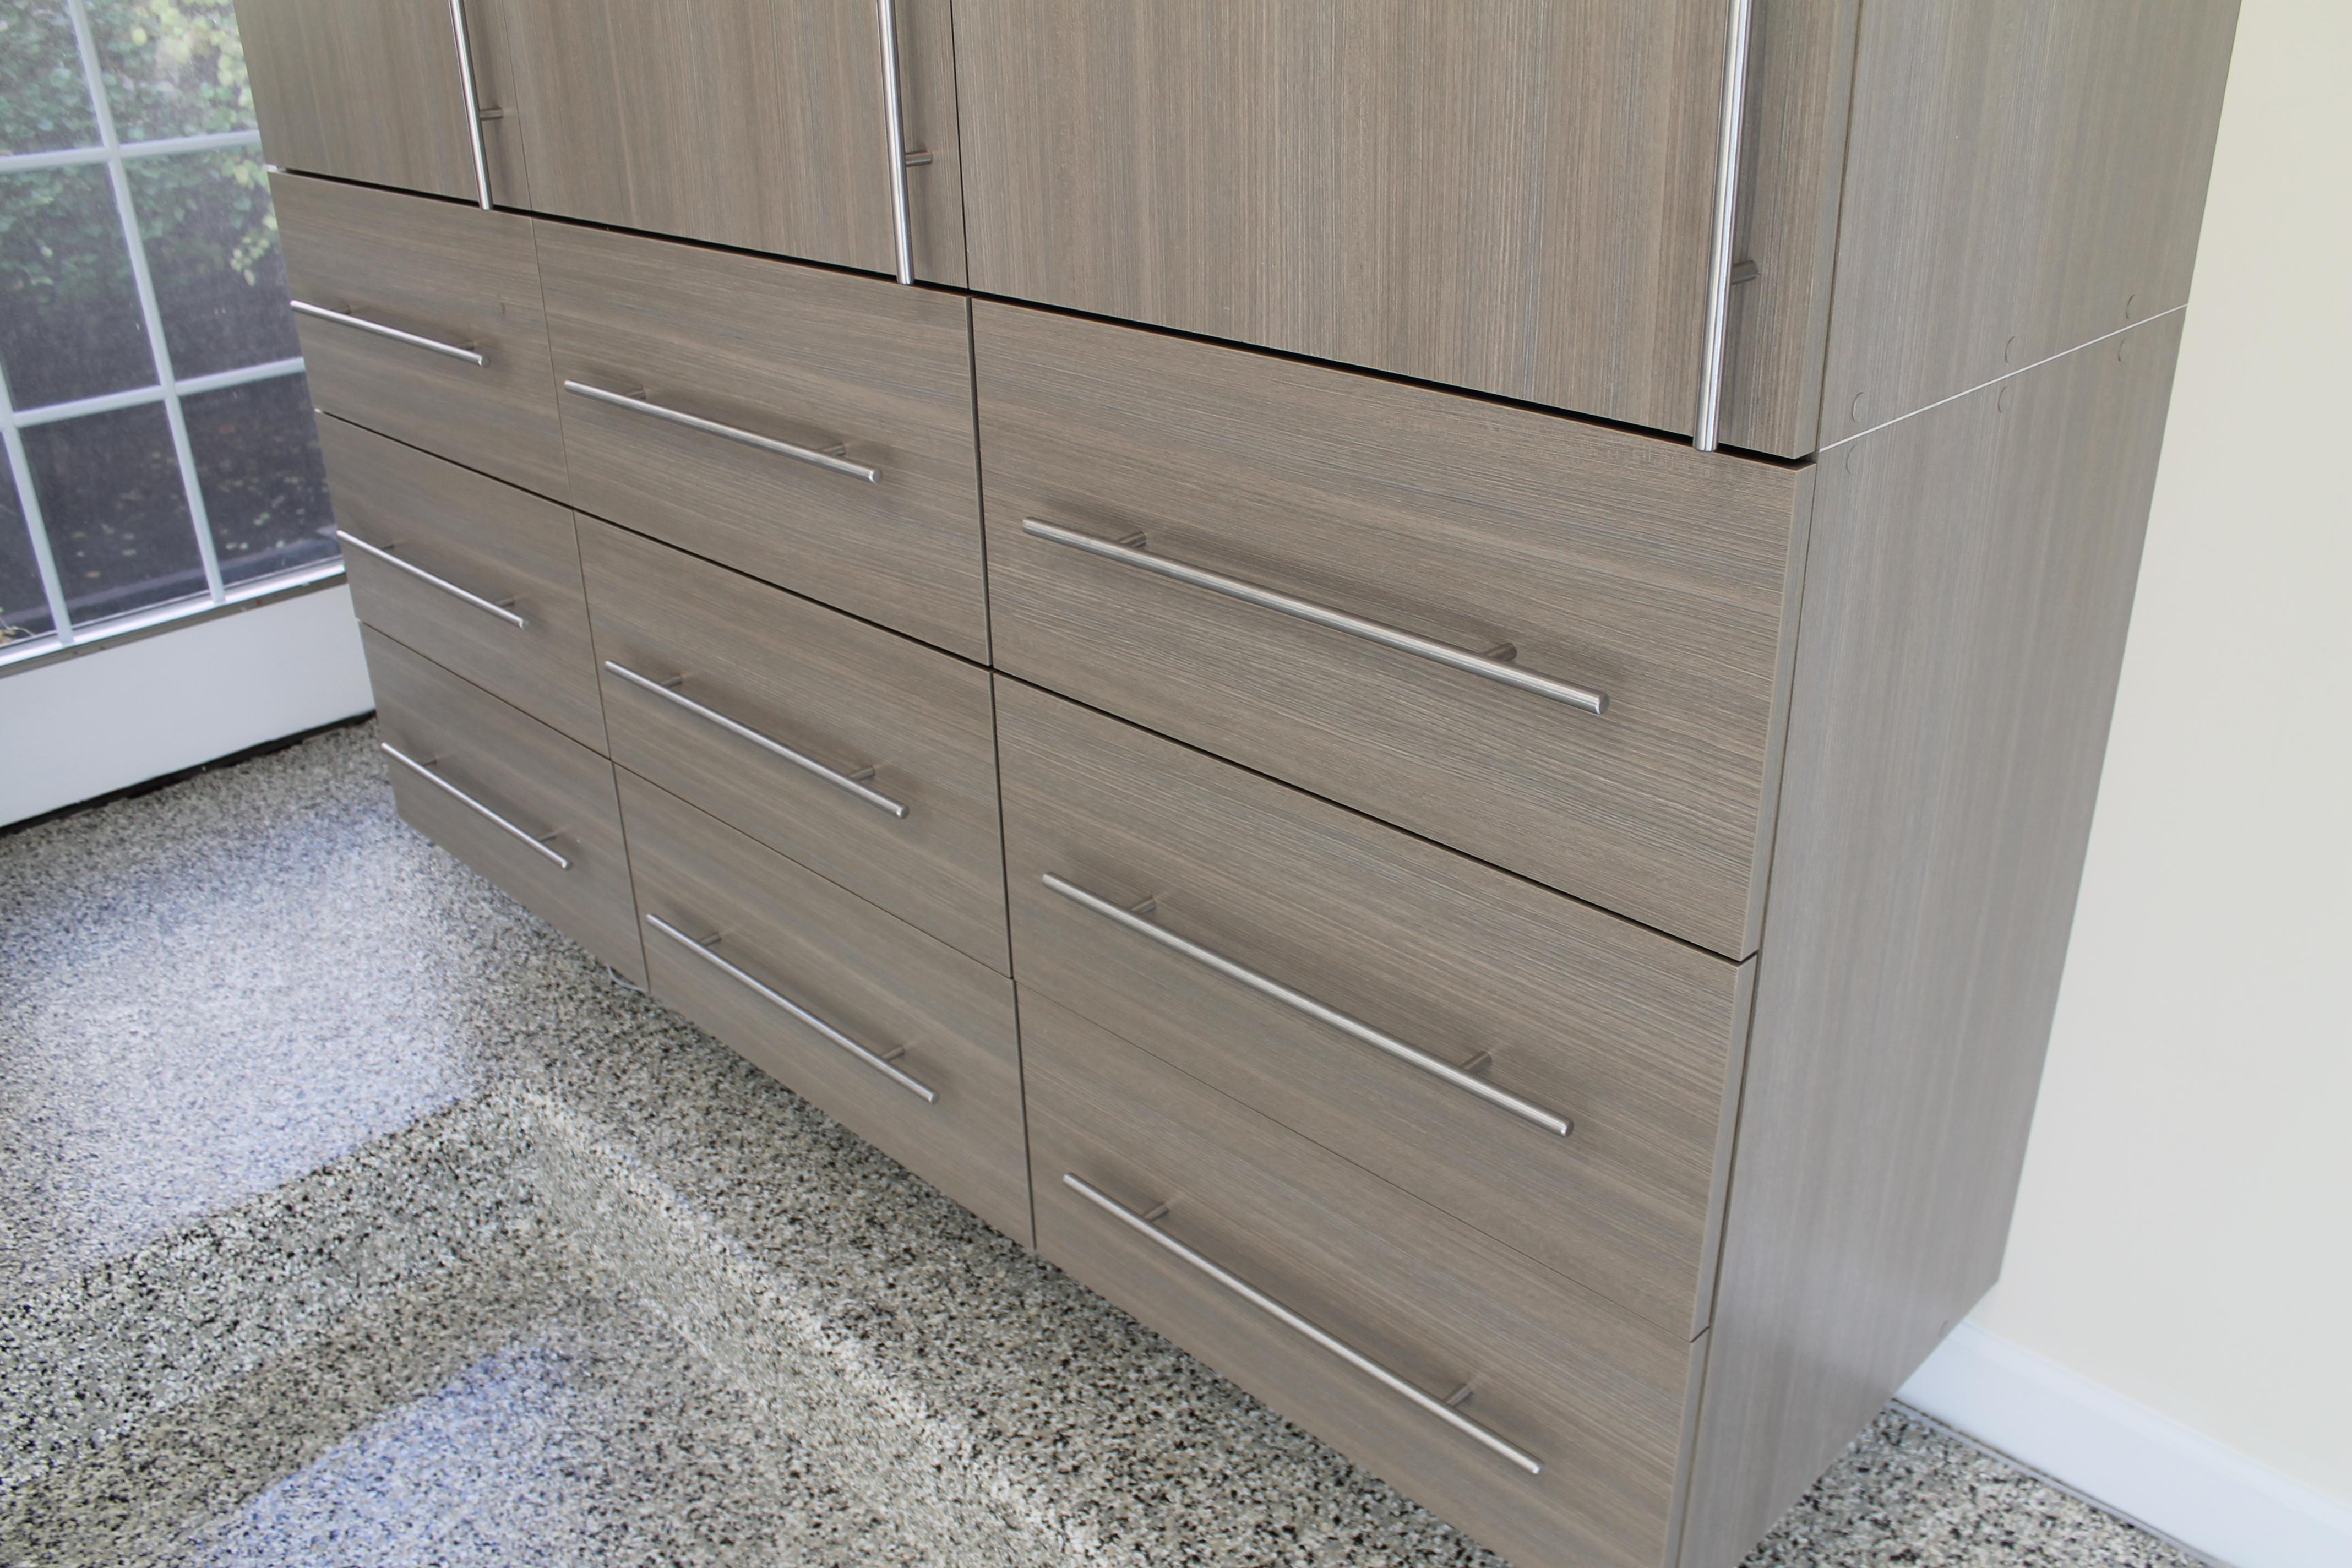 Driftwood Garage Cabinets 15